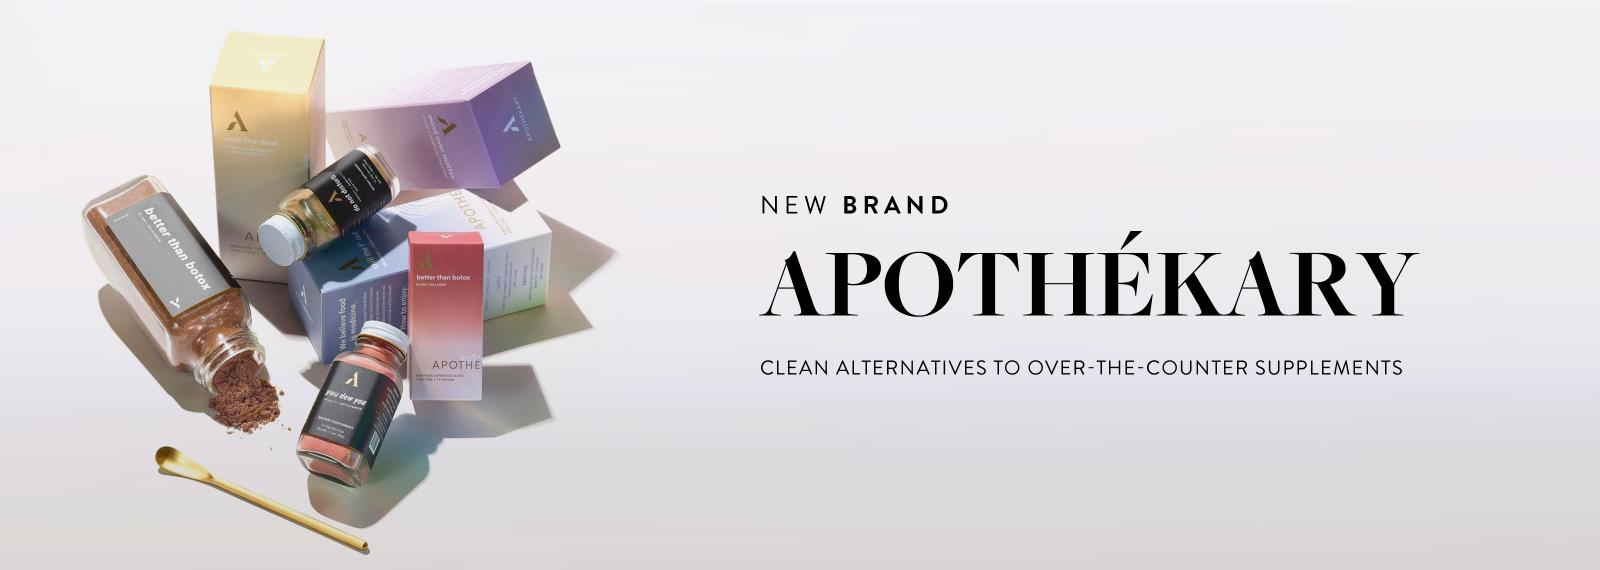 New Brand - APOTHÉKARY